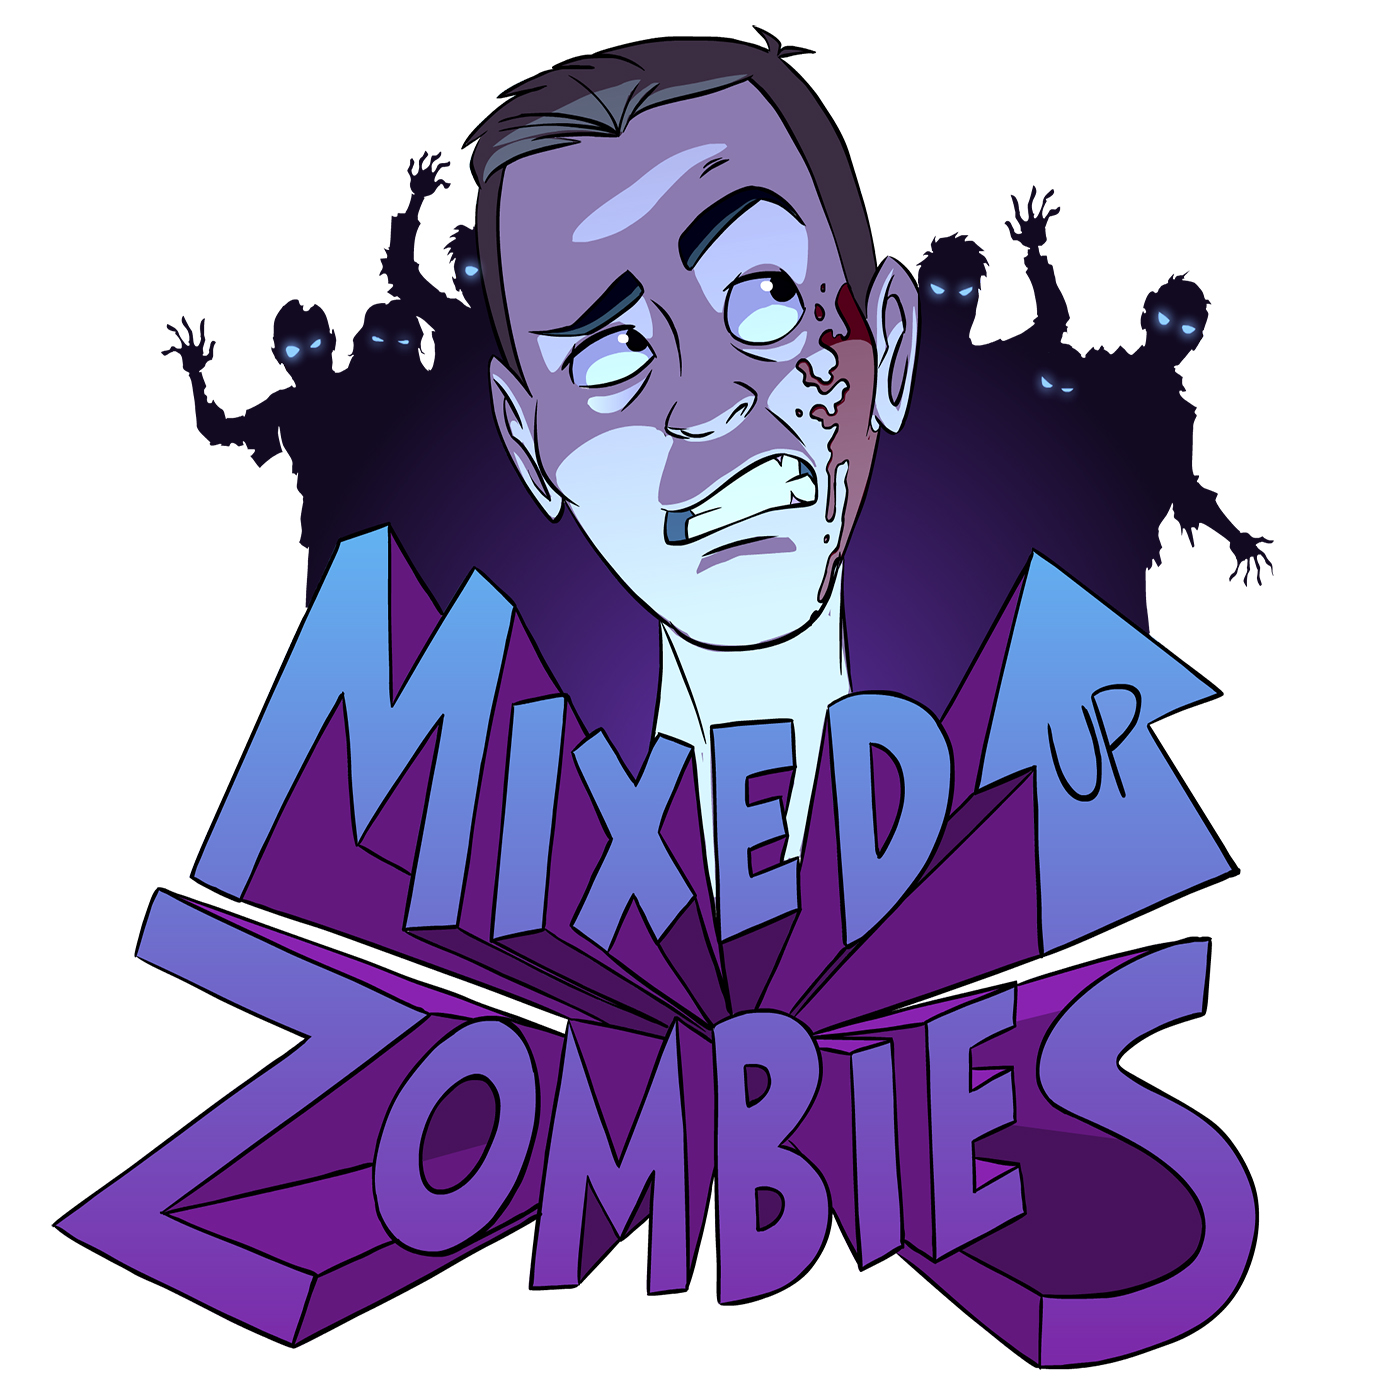 MixedUpzombies Interviews